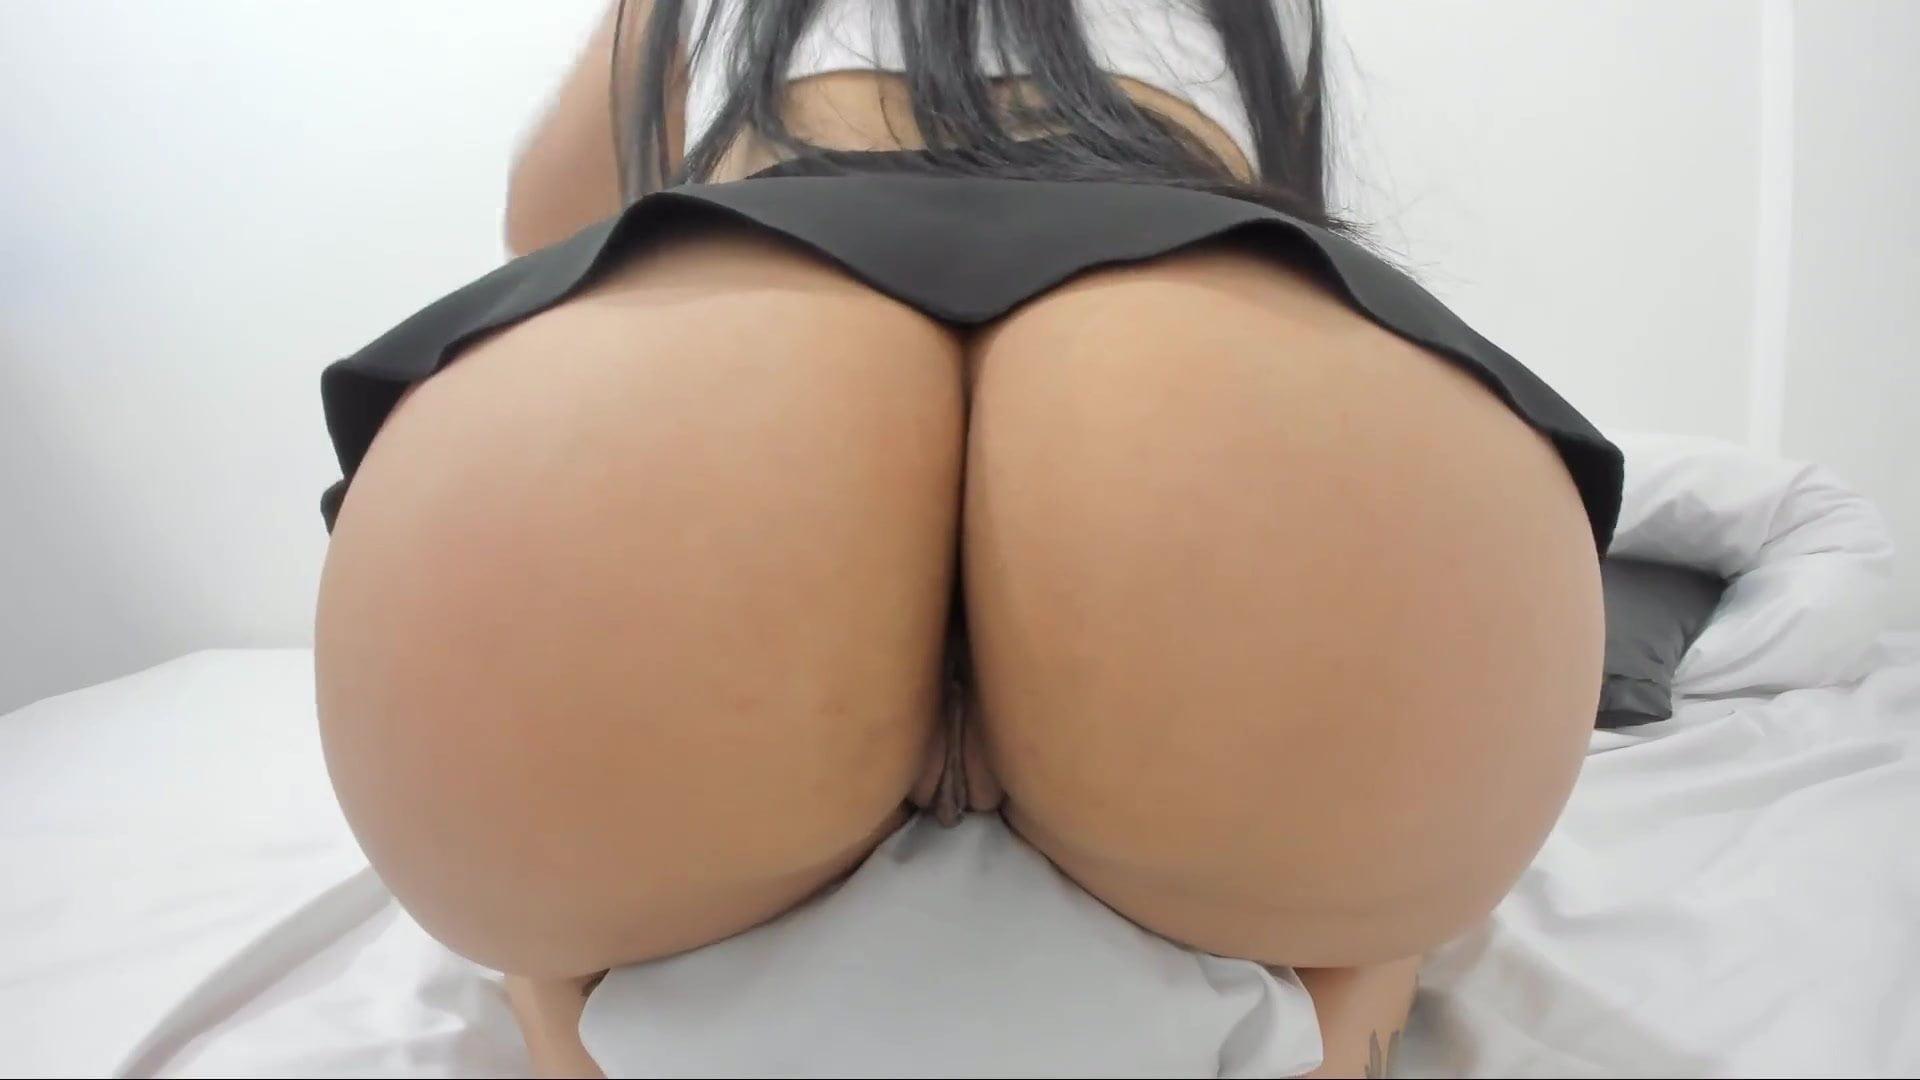 Slut fucked by girls